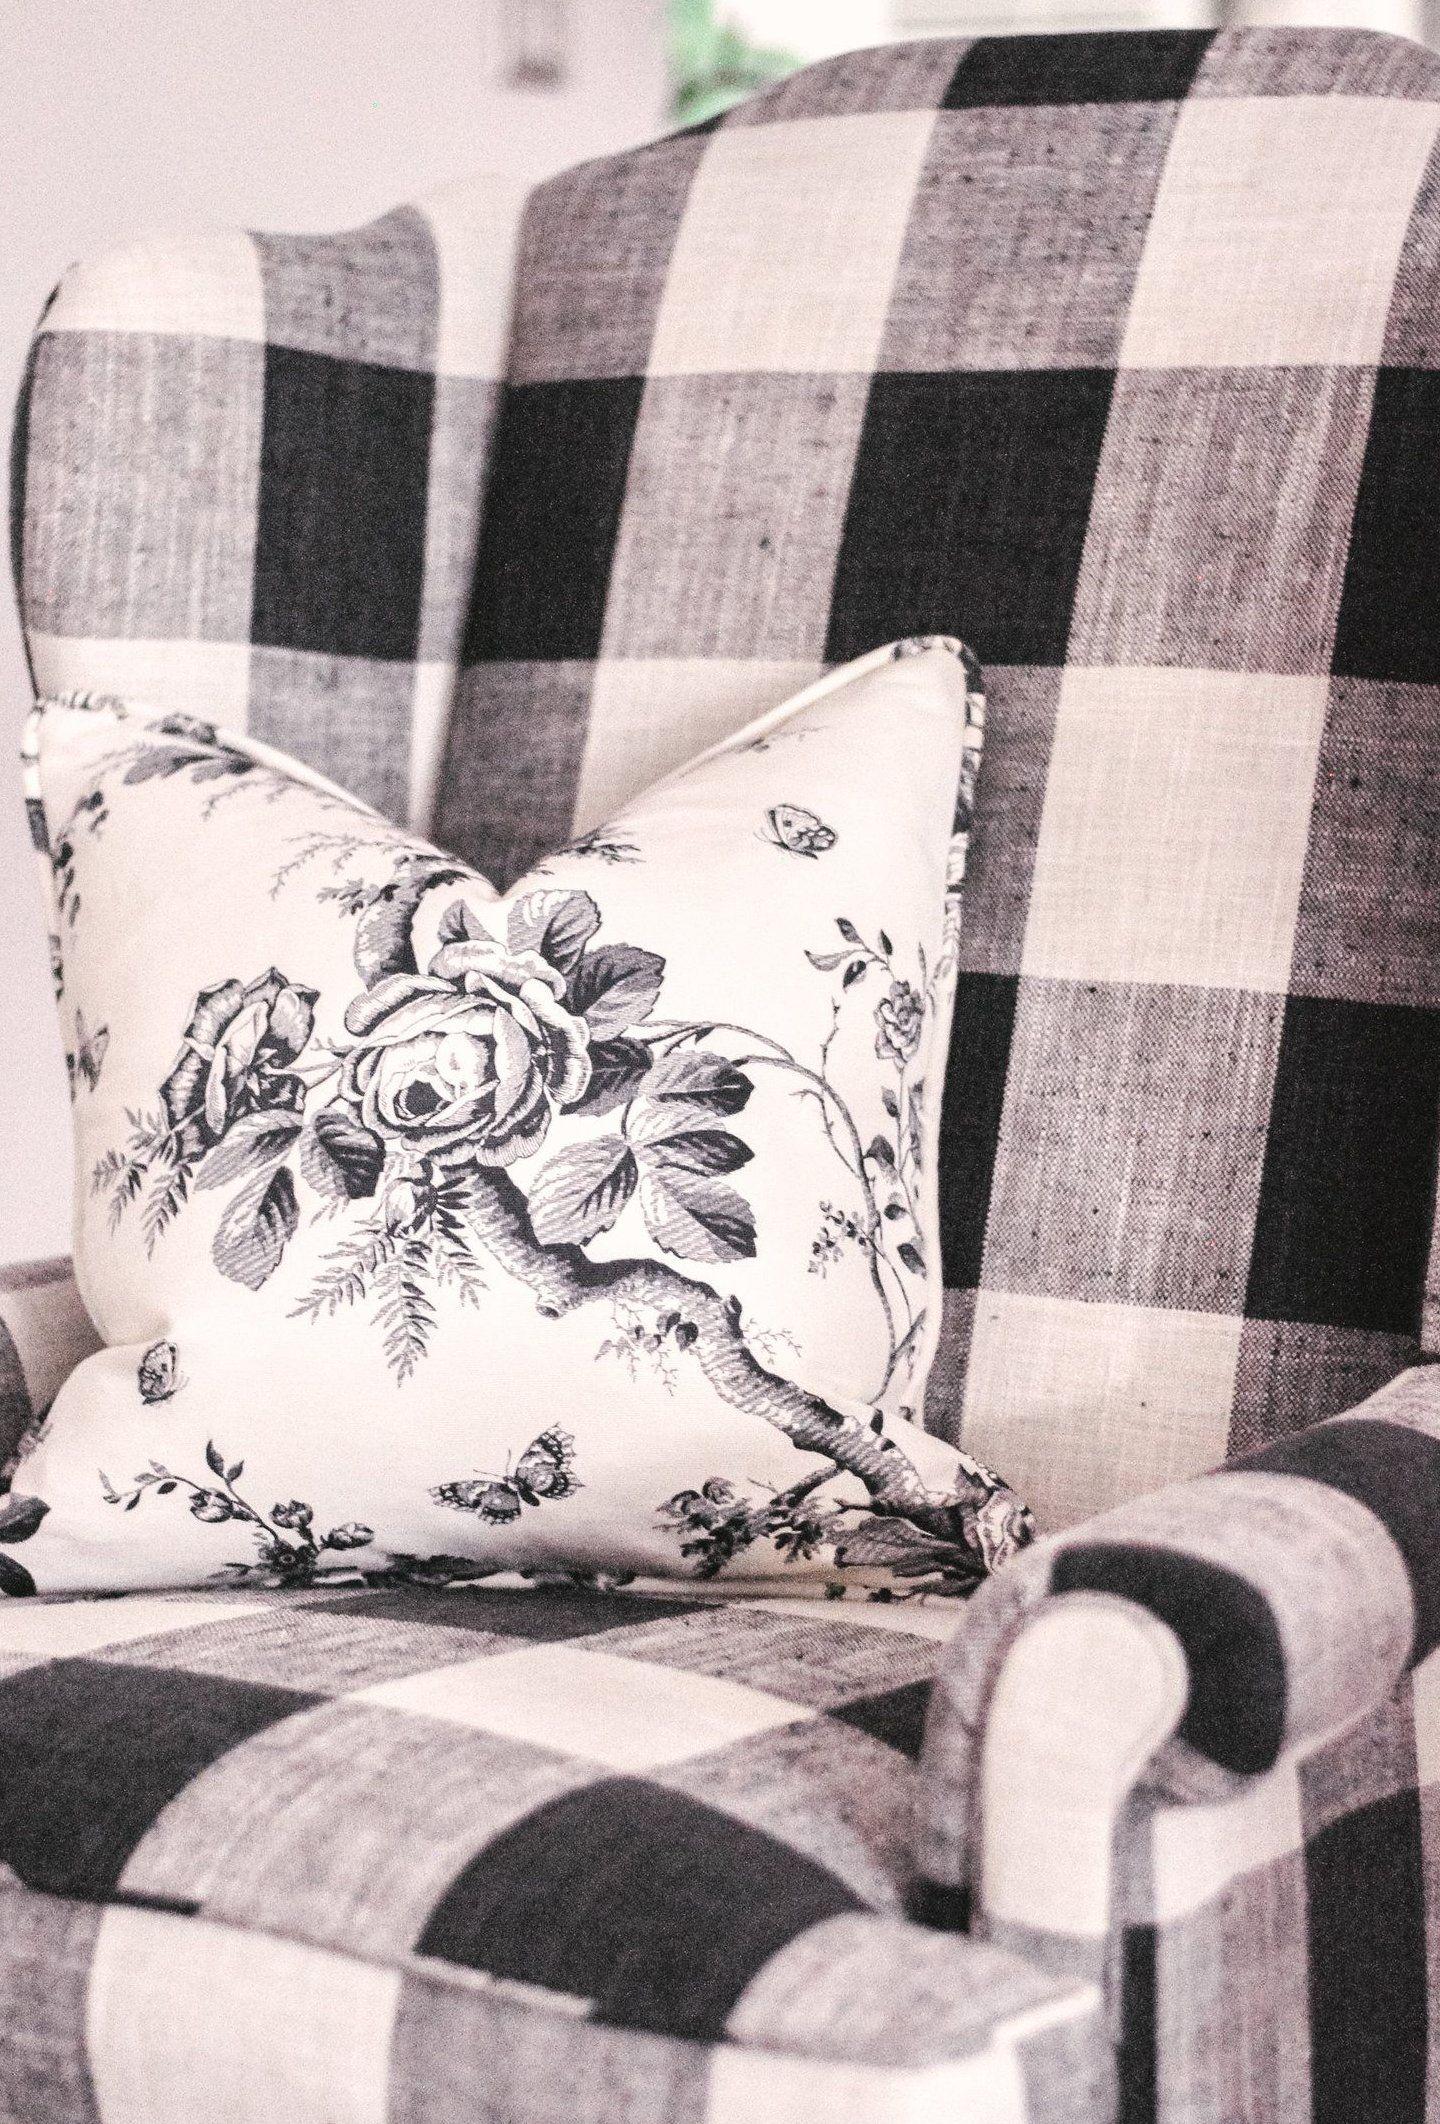 Our Farmhouse Living Room Makeover Our Buffalo Check Chair We Re Revealing Our Black And White Scandinavian Farmhouse Inspire 2020 Kanepeler Koltuklar Kelebekler